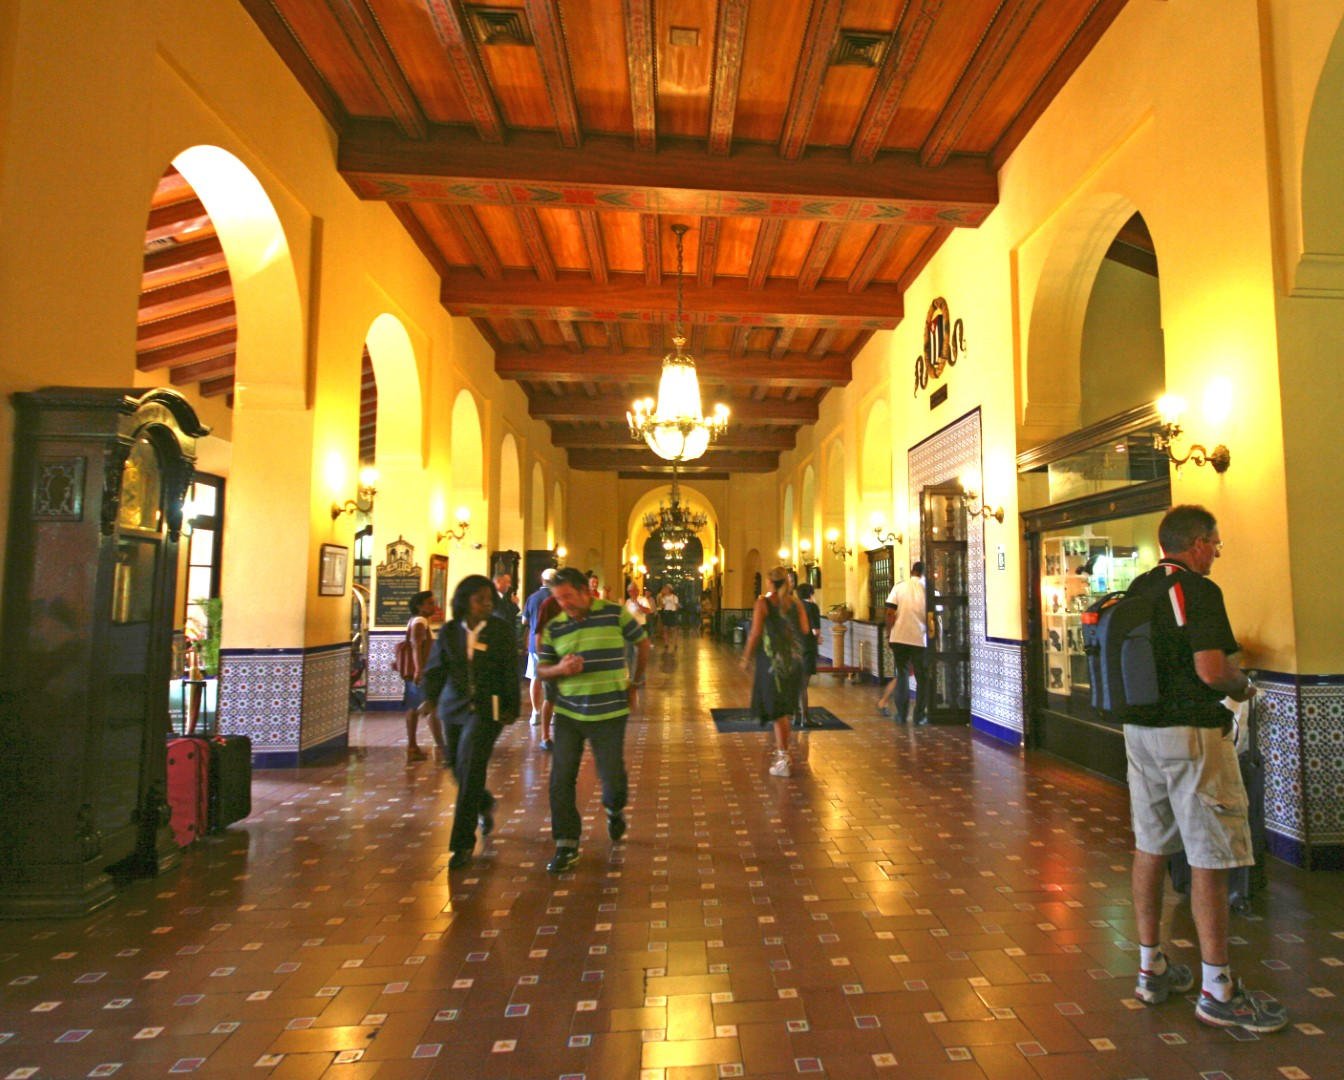 Lobby of the Hotel Nacional in Havana